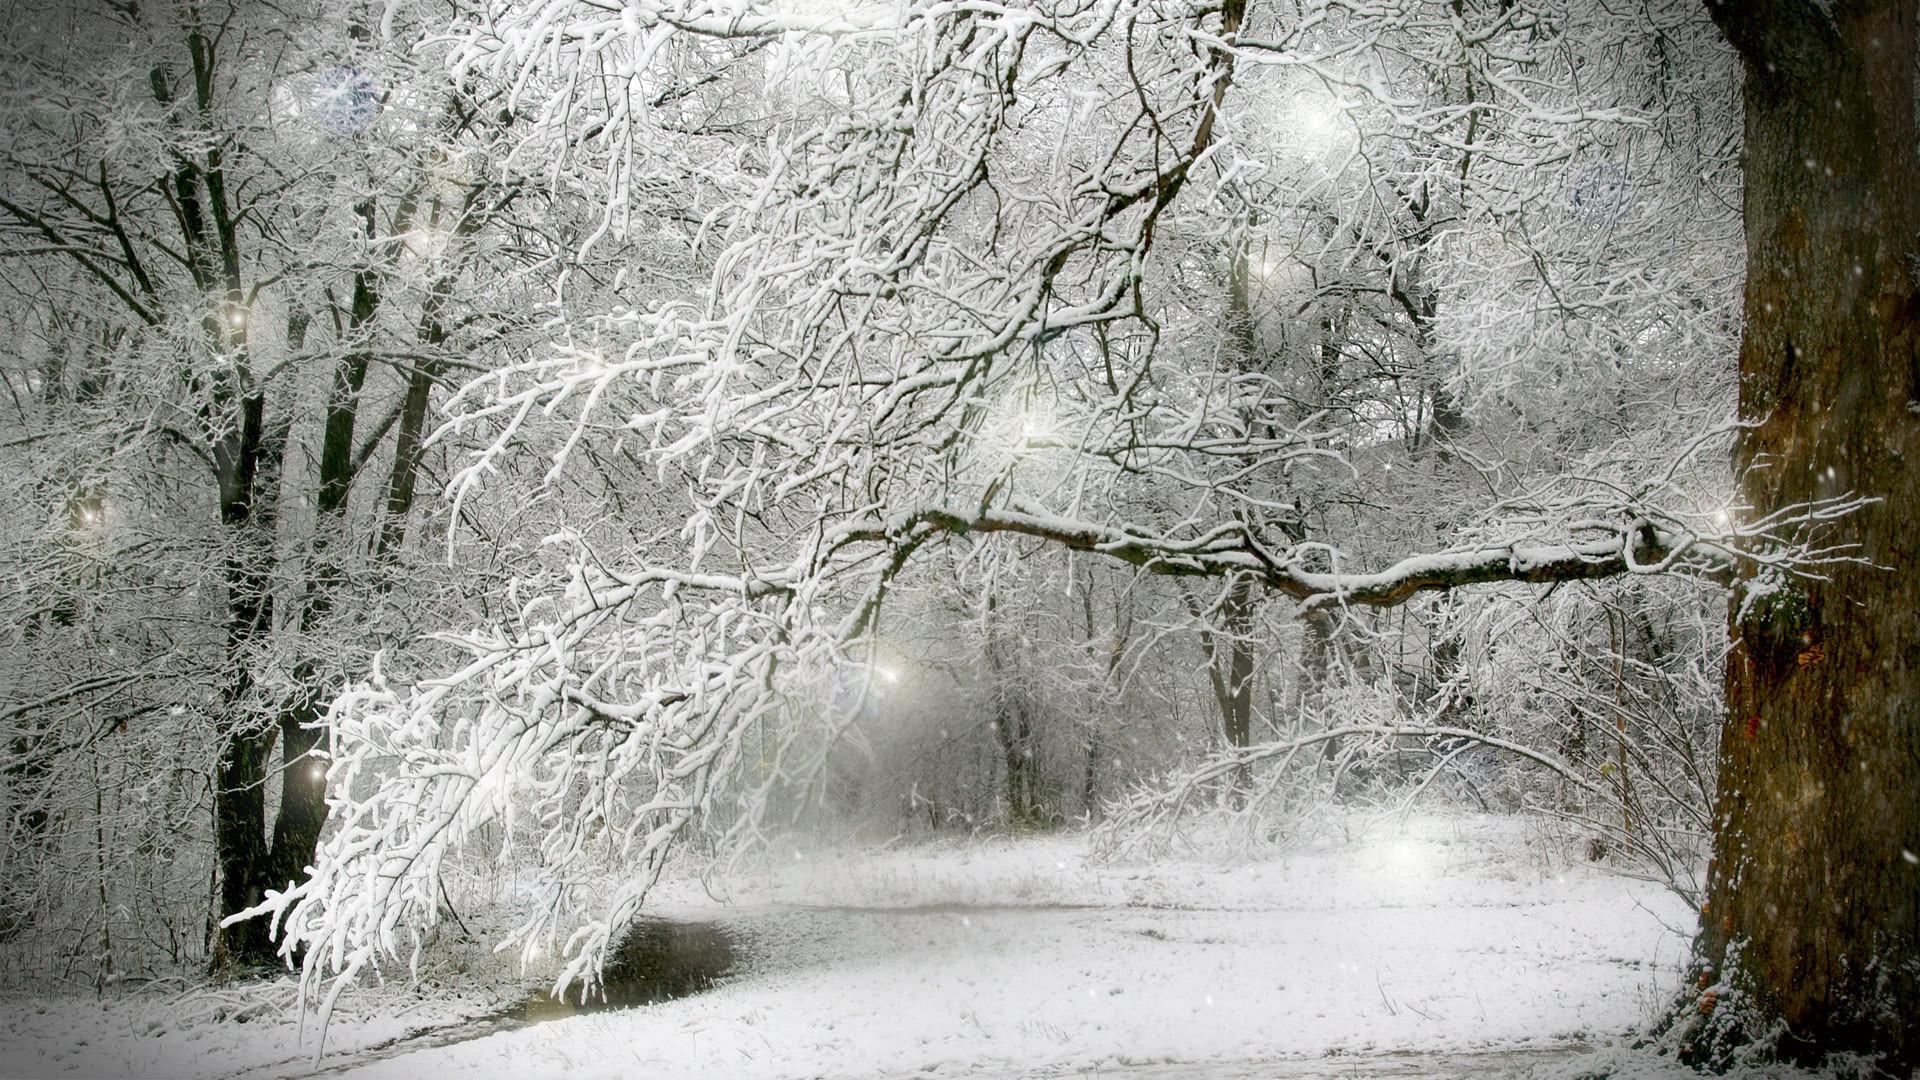 1920 x 1080 px winter snow scenes wallpaper: Full HD Pictures by Lawton  Kingsman   sharovarka   Pinterest   Full hd pictures and Hd picture